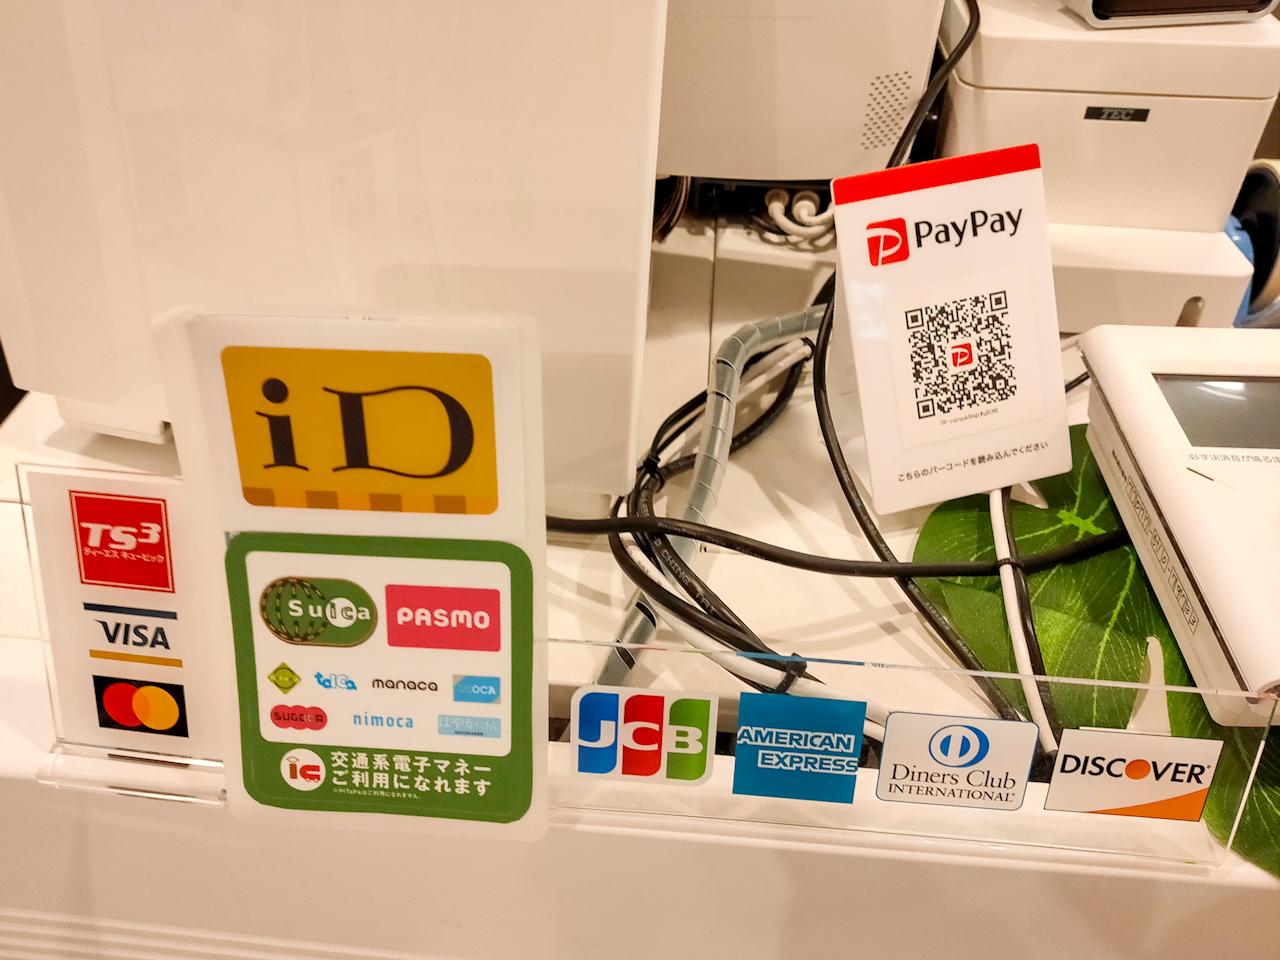 Suica やクレジットカード決済、PayPay 払いが可能